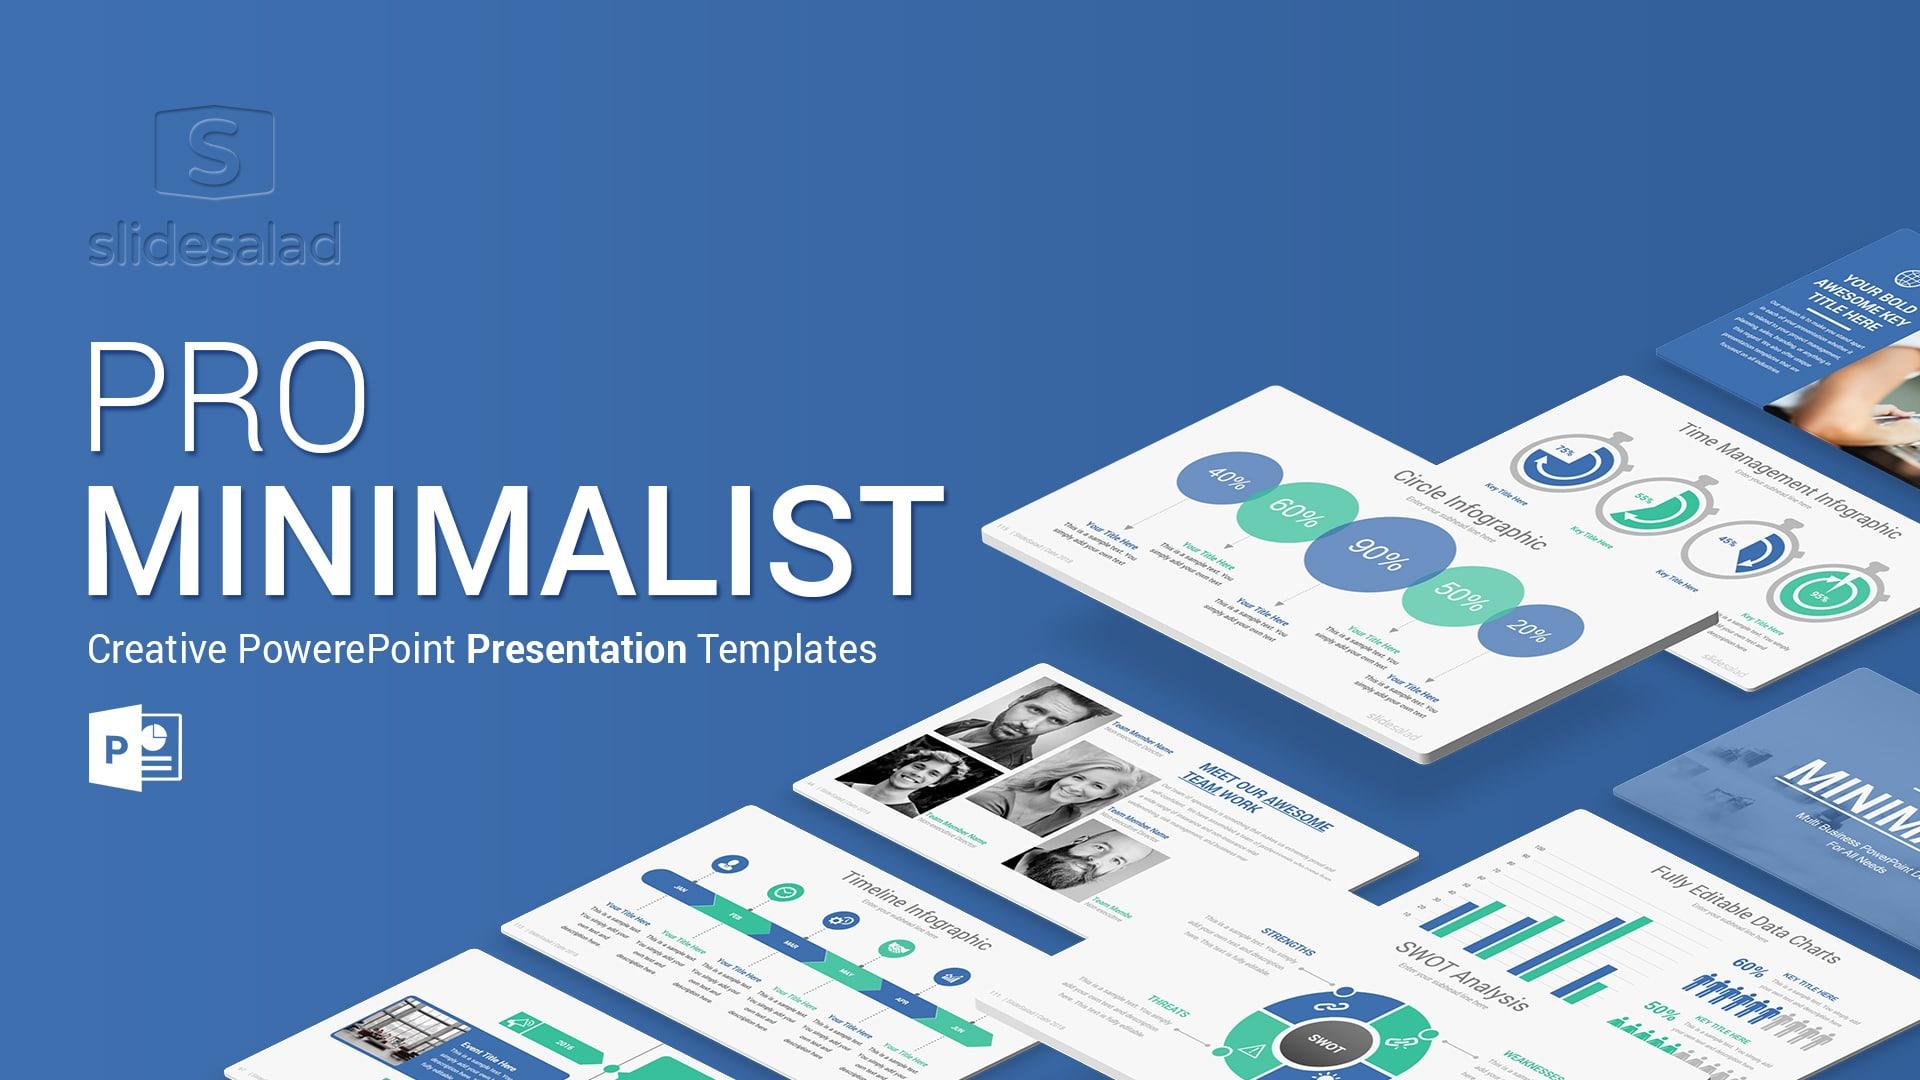 Pro Minimalist PowerPoint Template Designs – Beautiful Animation Presentation Templates